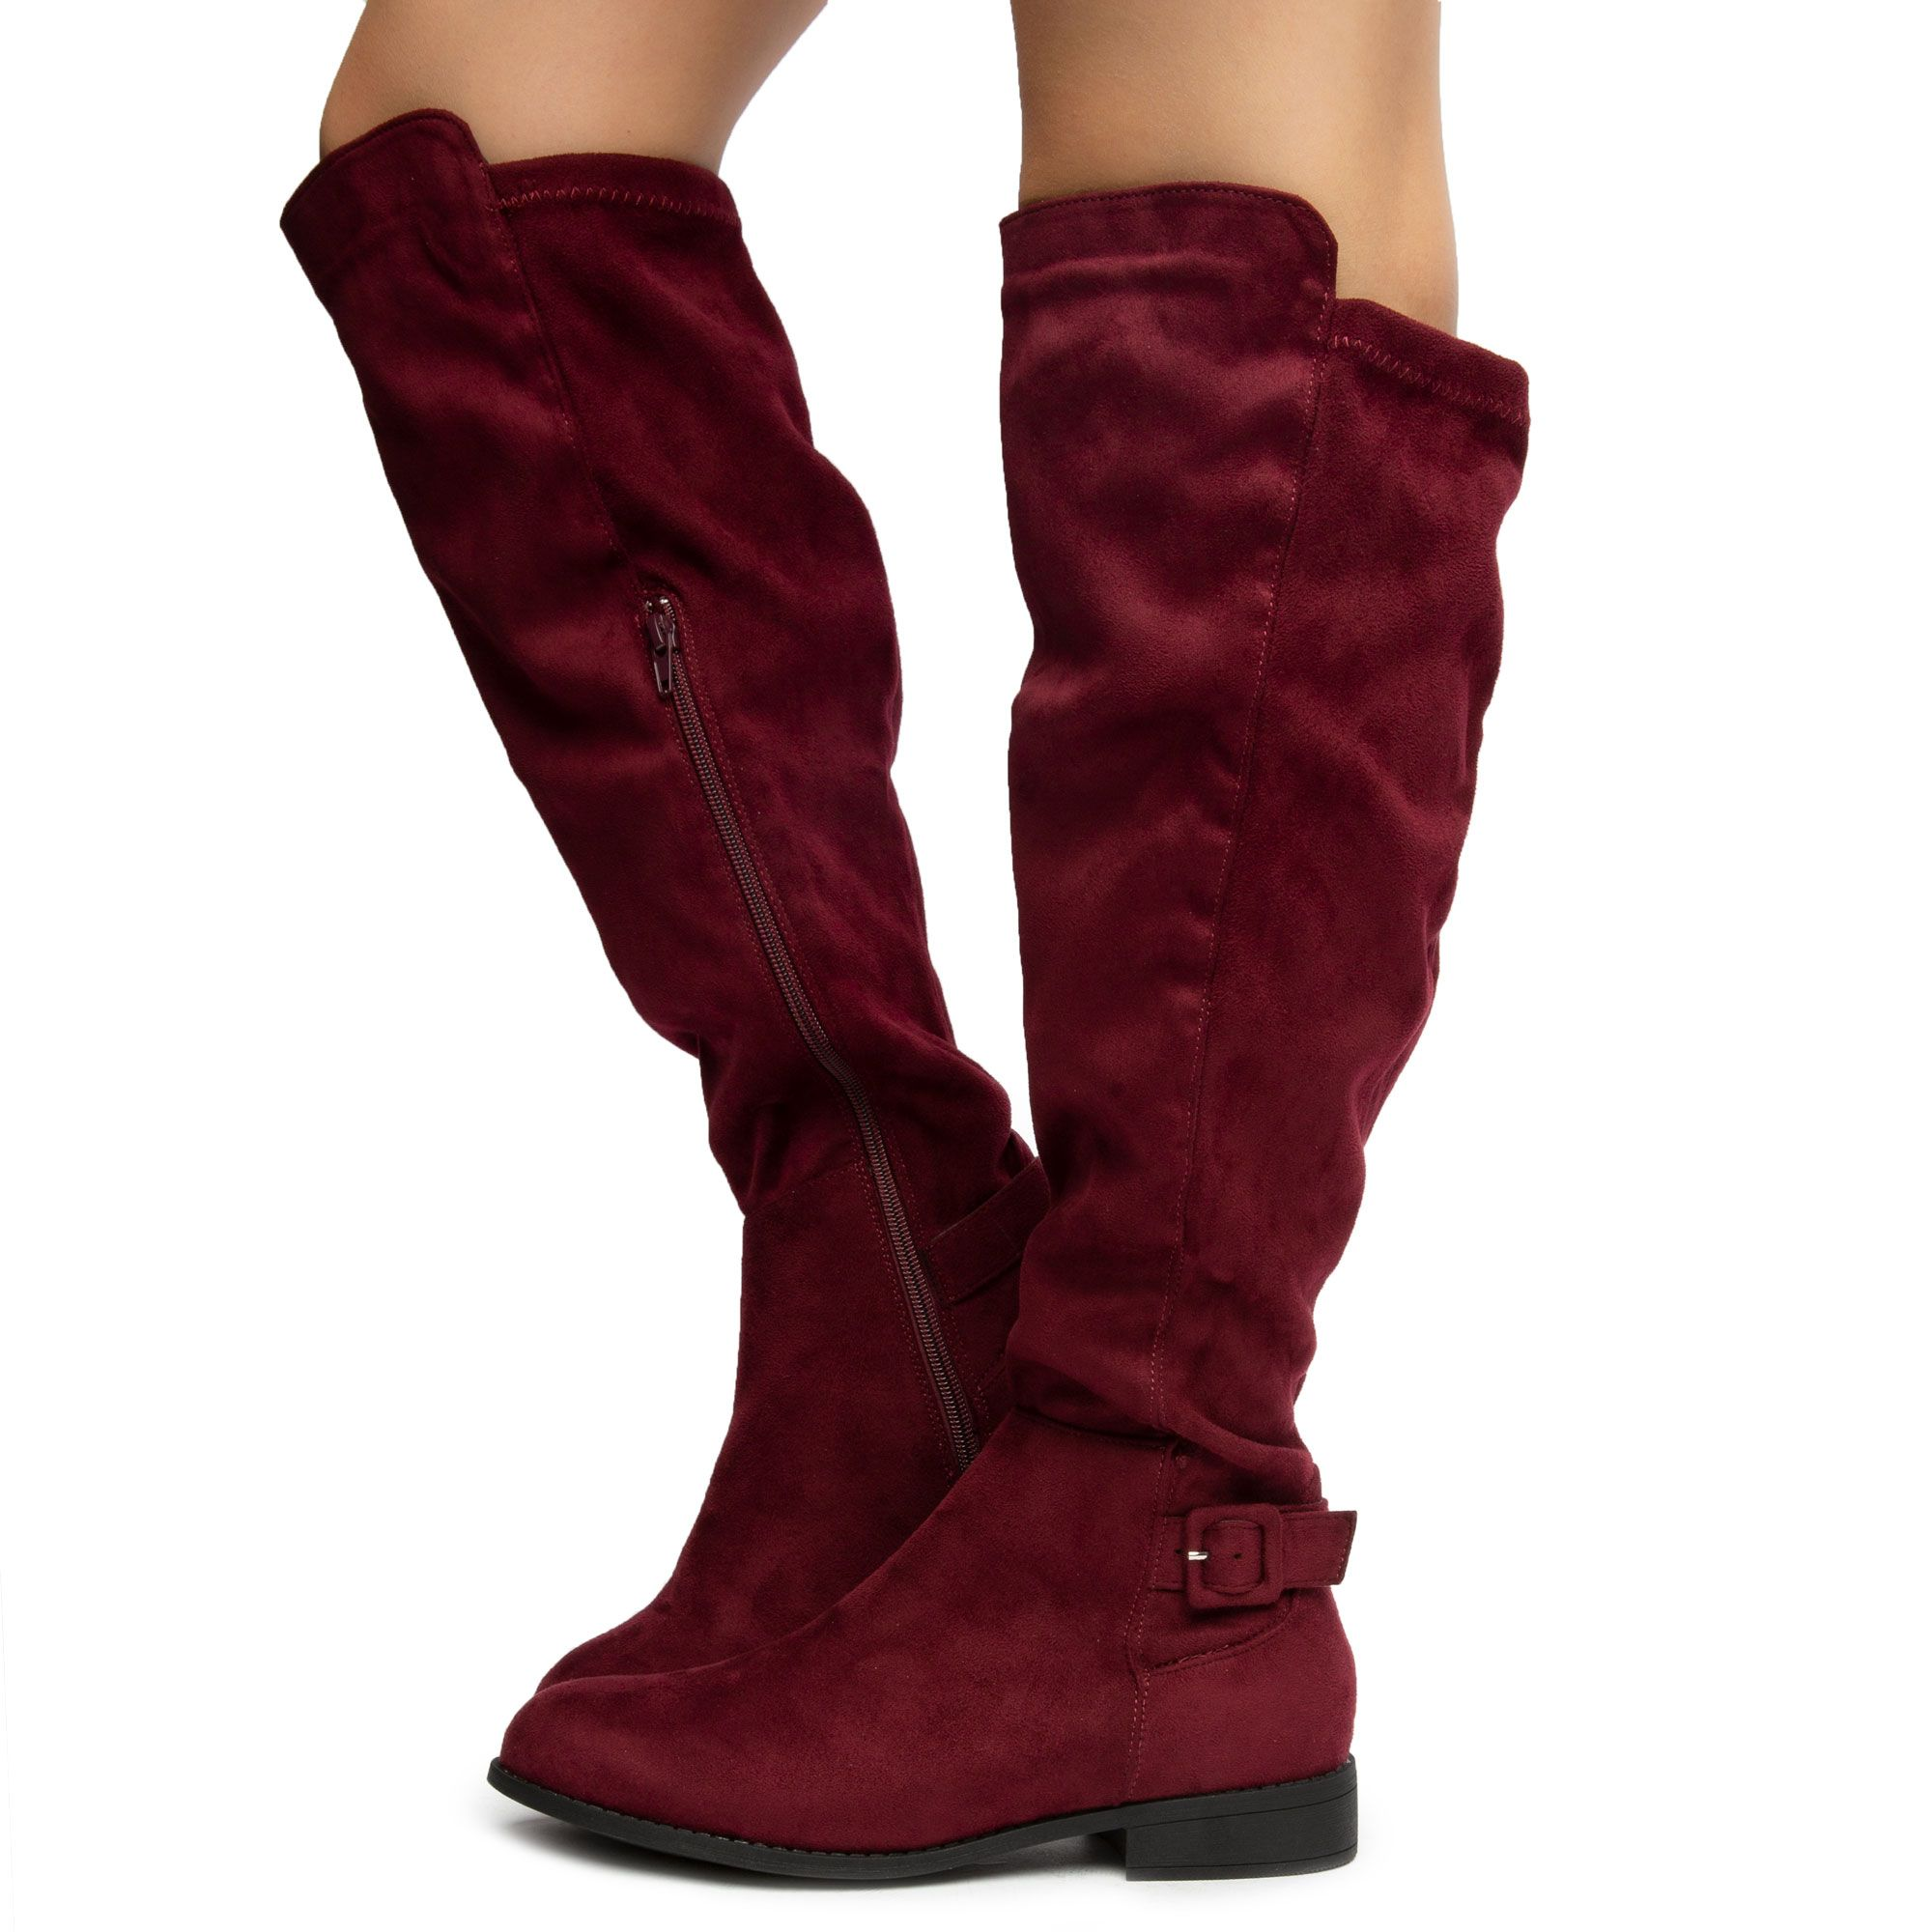 Oksana-171 Knee-High Boots